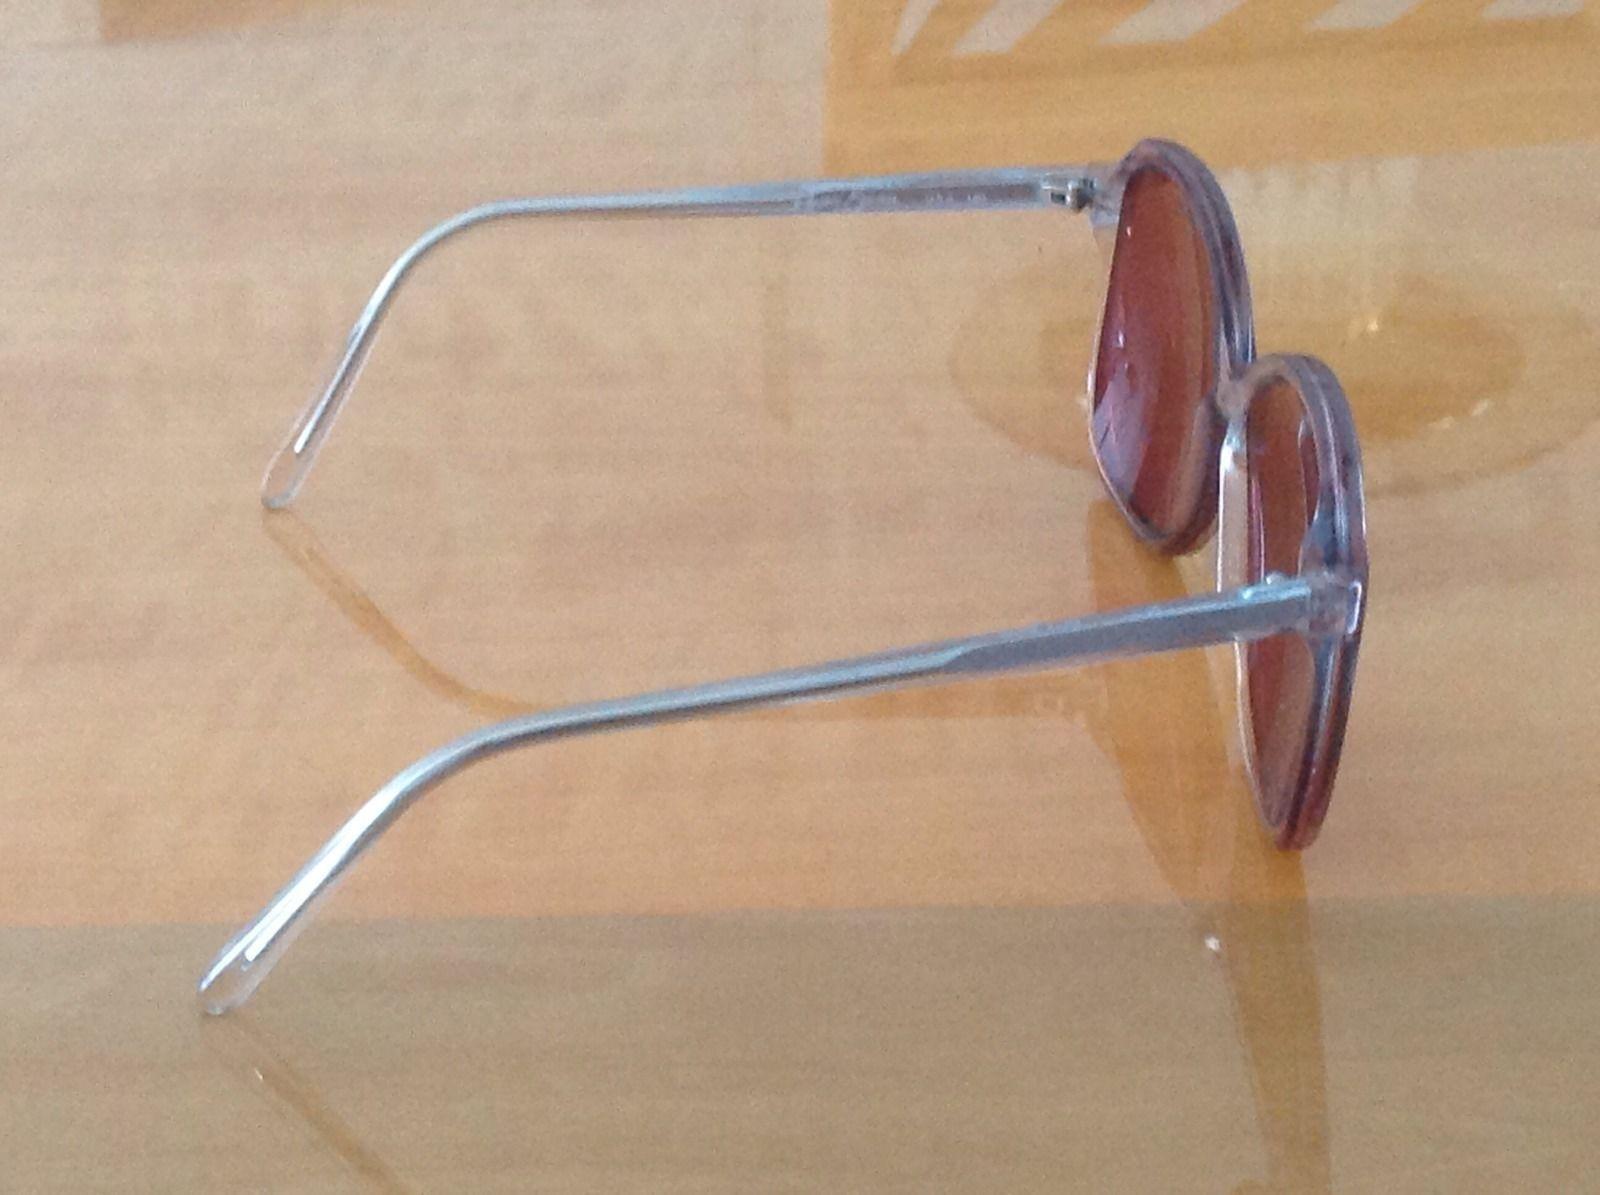 VTG Regency Eyewear Blue Rose Sunglasses by Tart Optical Clear Frames